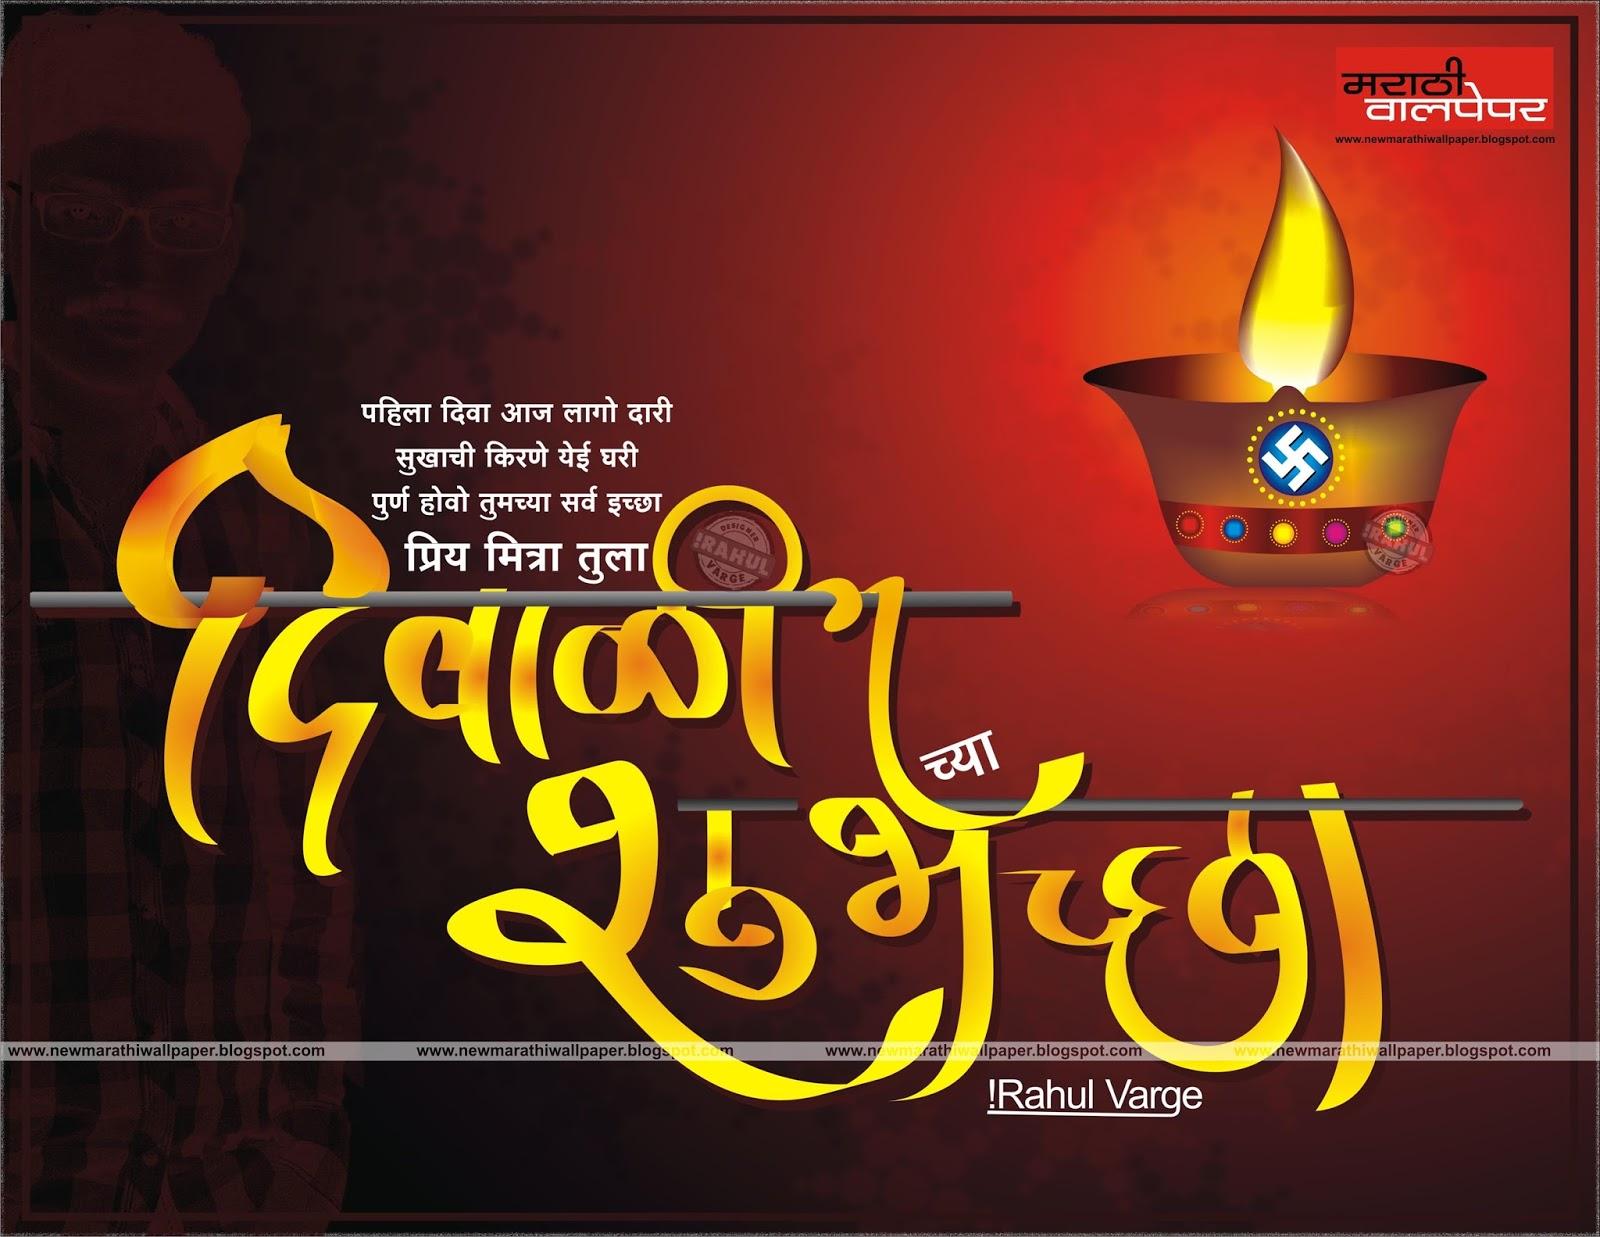 Marathi Greetings